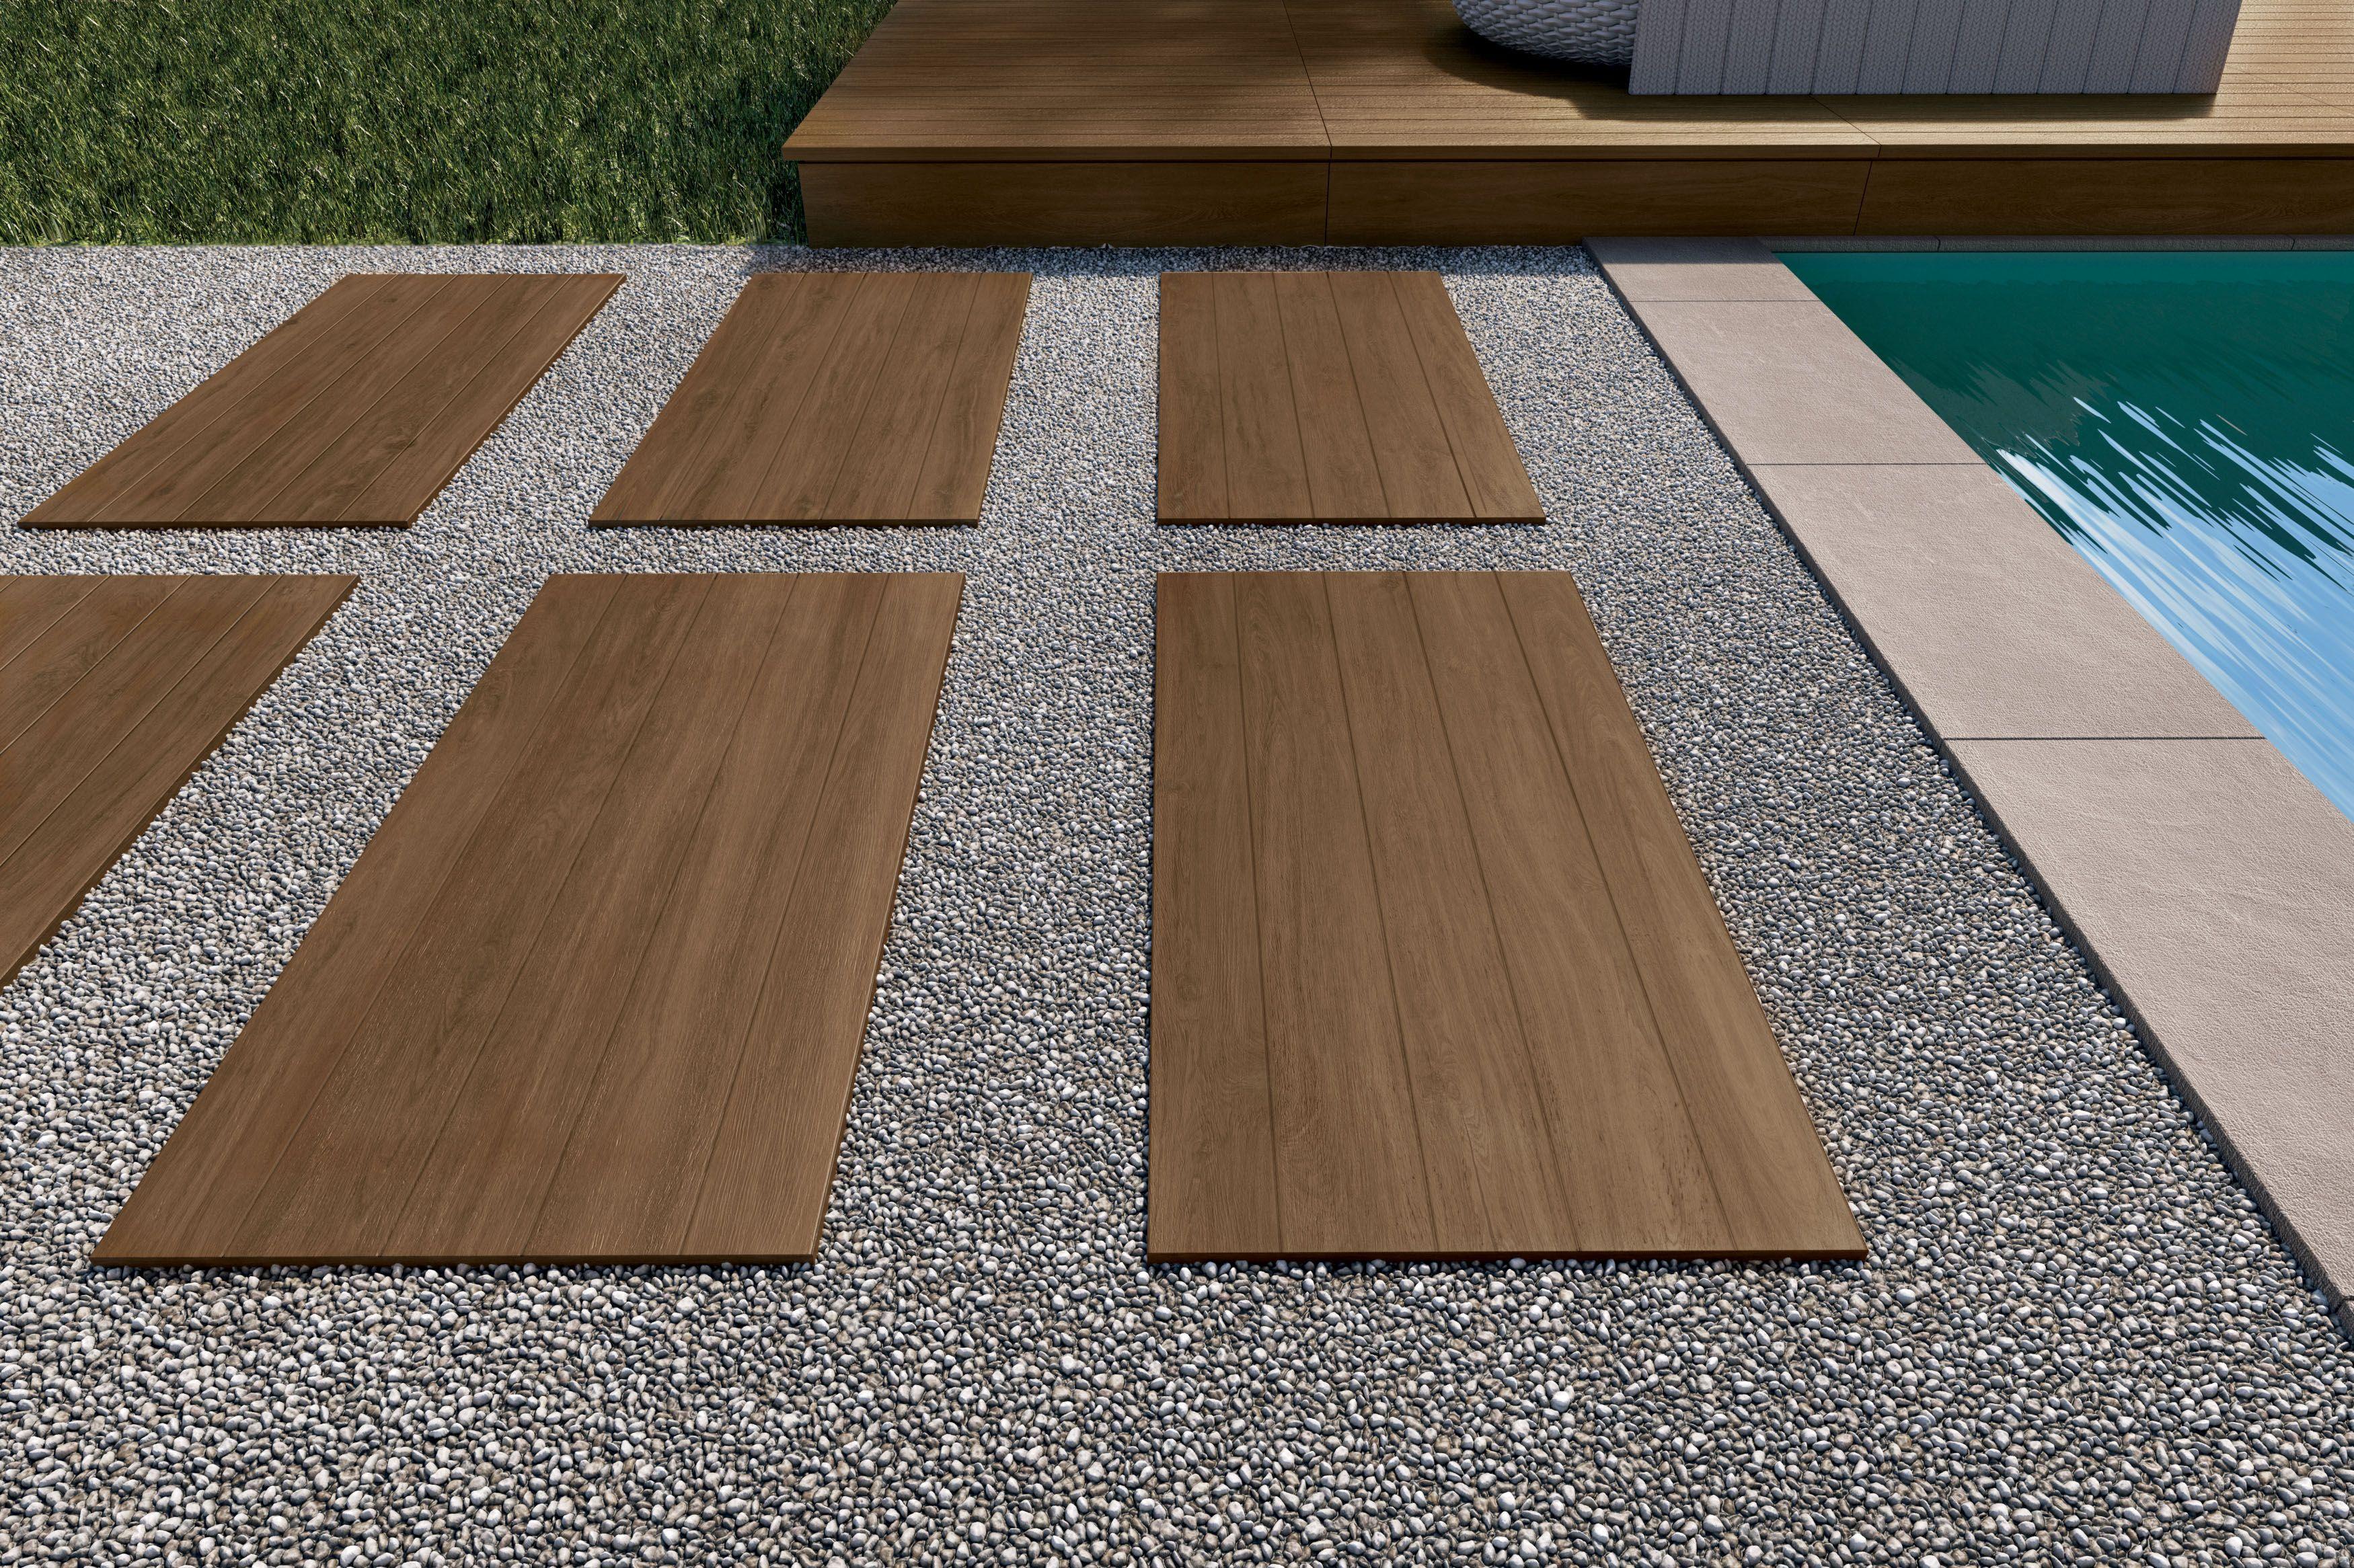 Sassuolo Prestige Brown 2cm 18x36 Exterior Porcelain Tile Exterior Tiles Tile Installation Outdoor Areas